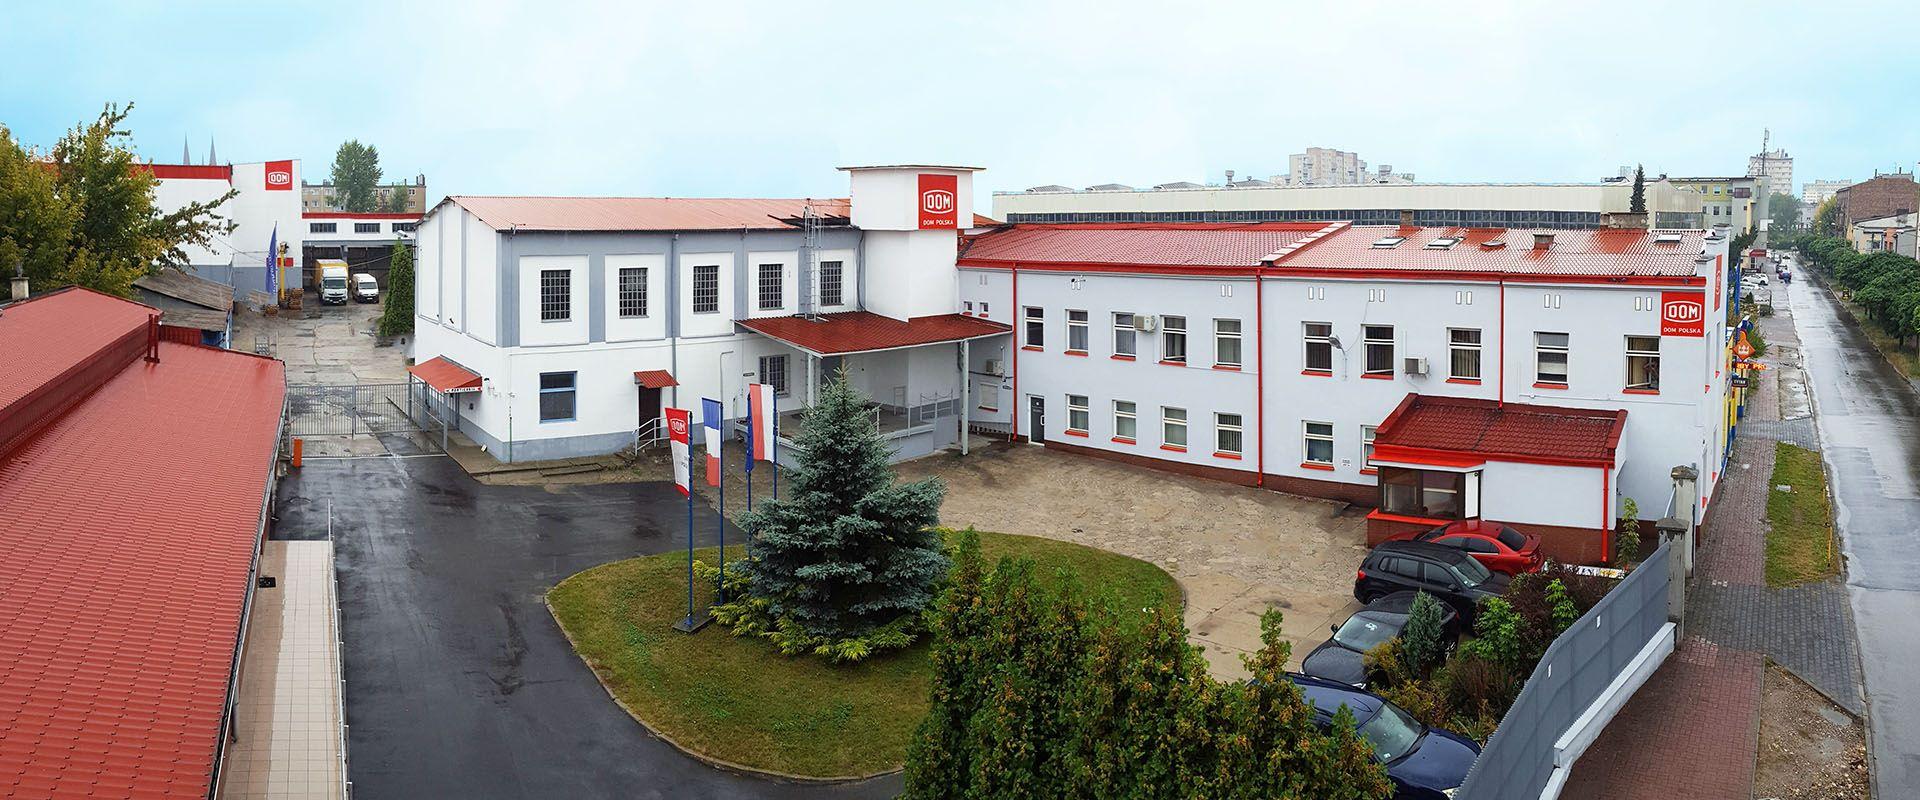 Dom Polska biuro